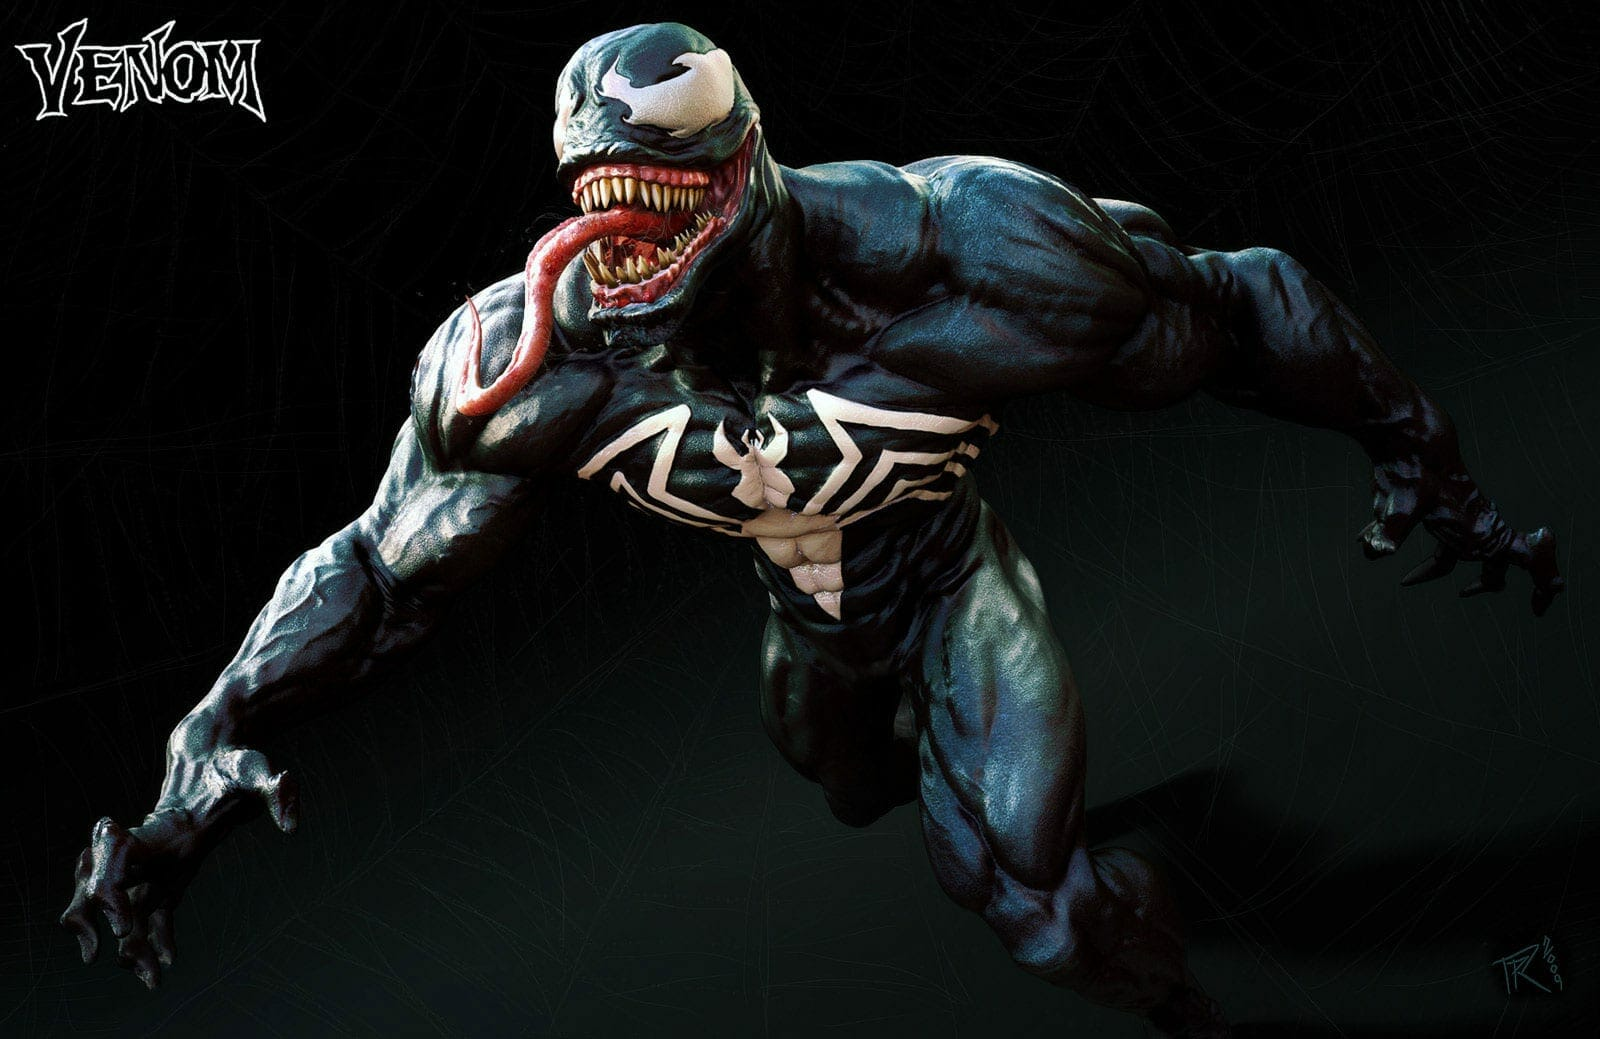 venom - Sony is planning distinctive spin-offs to Spider-man Homecoming!